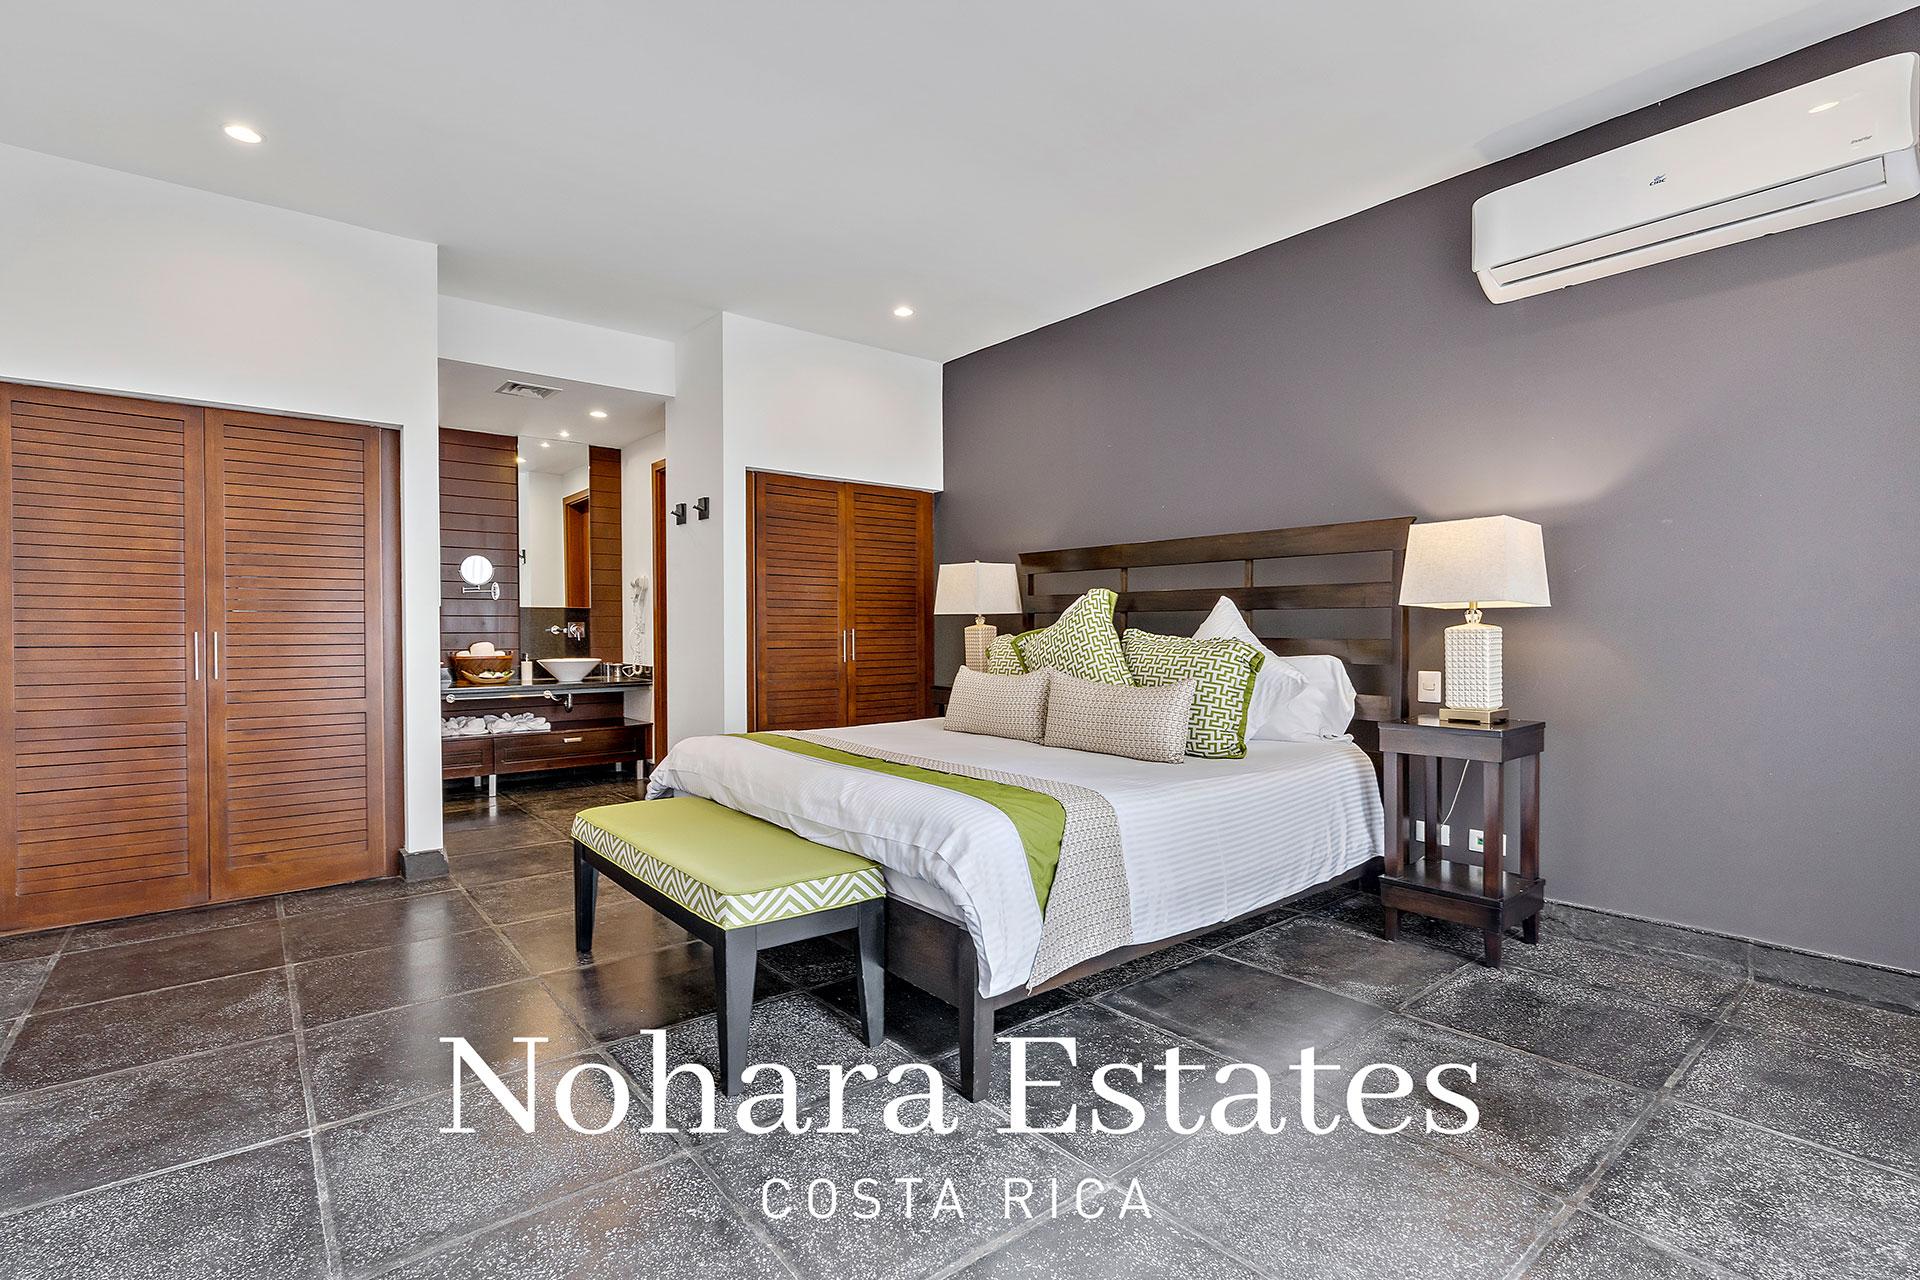 Nohara Estates Costa Rica 122 Apartment Quepos Los Altos 15